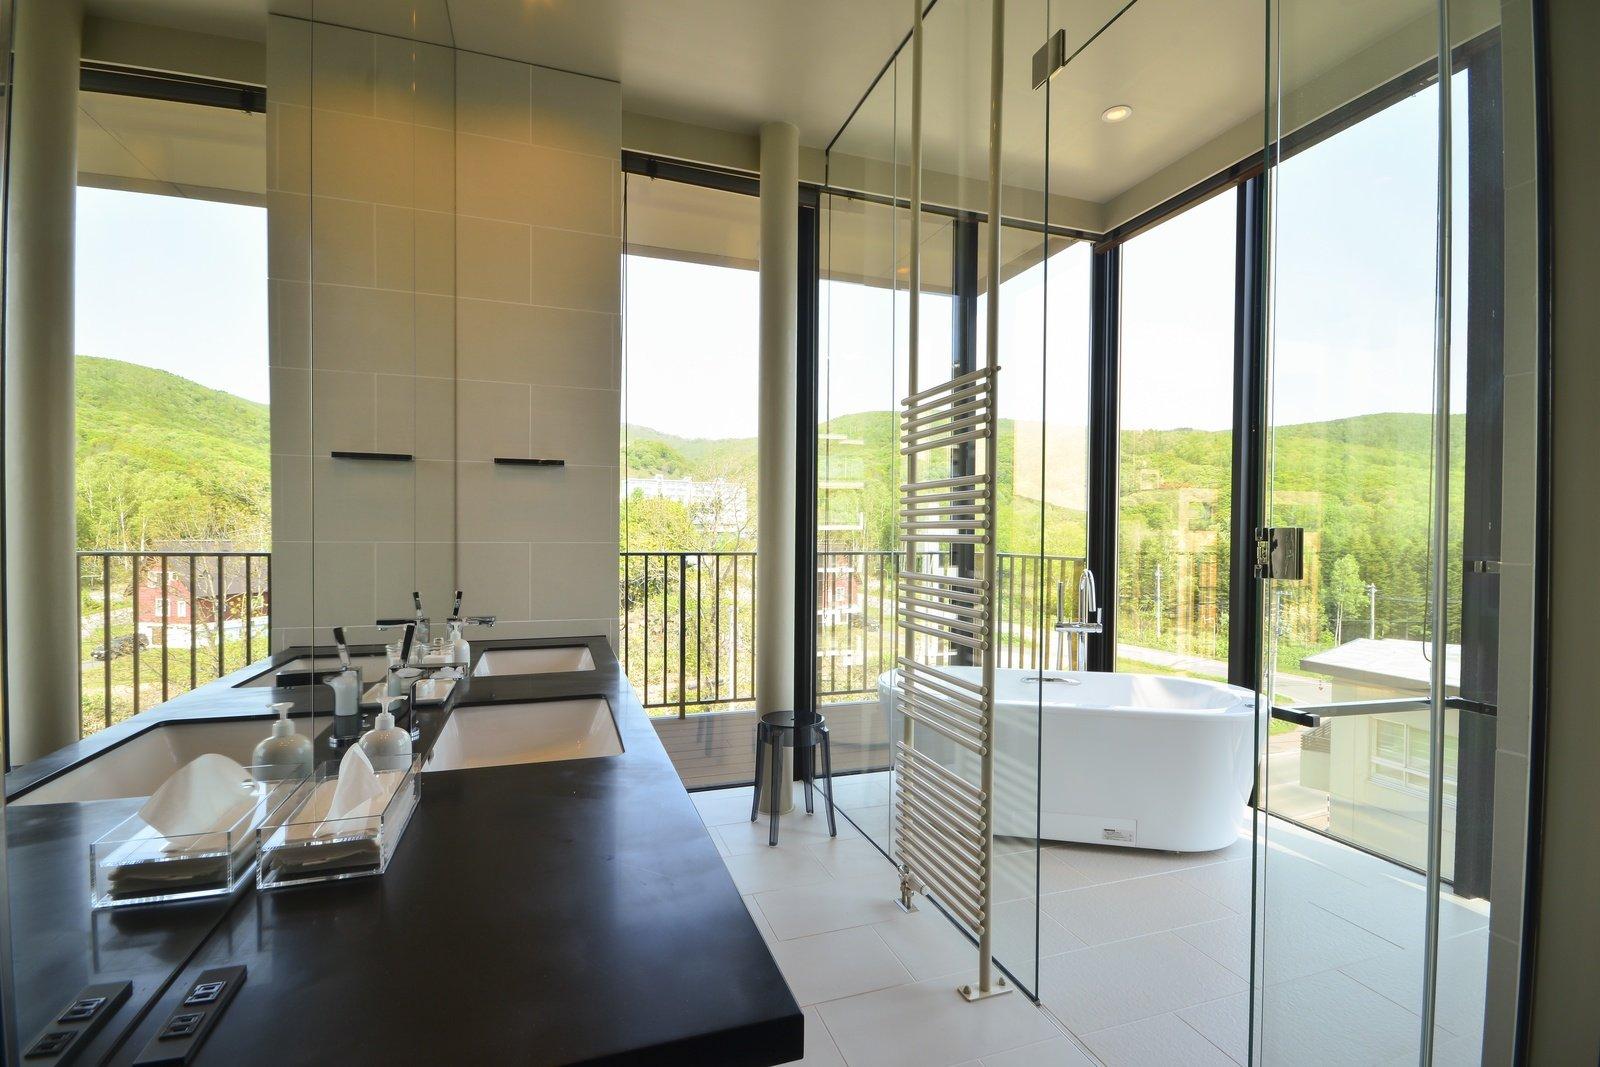 Muse 601 pth master bathroom large